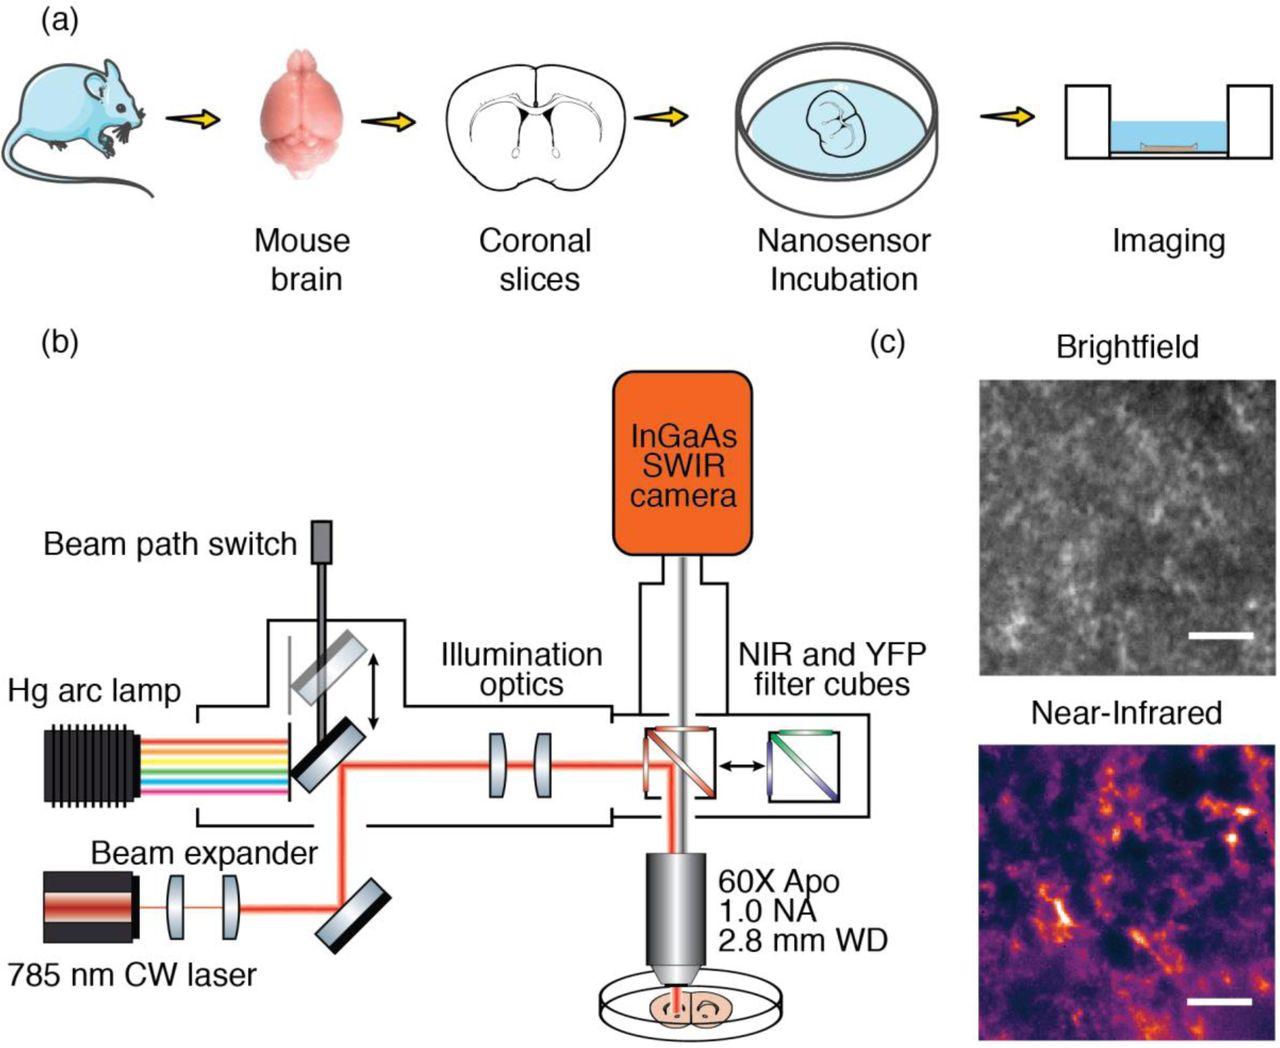 medium resolution of imaging striatal dopamine release using a non genetically encoded near infrared fluorescent catecholamine nanosensor biorxiv